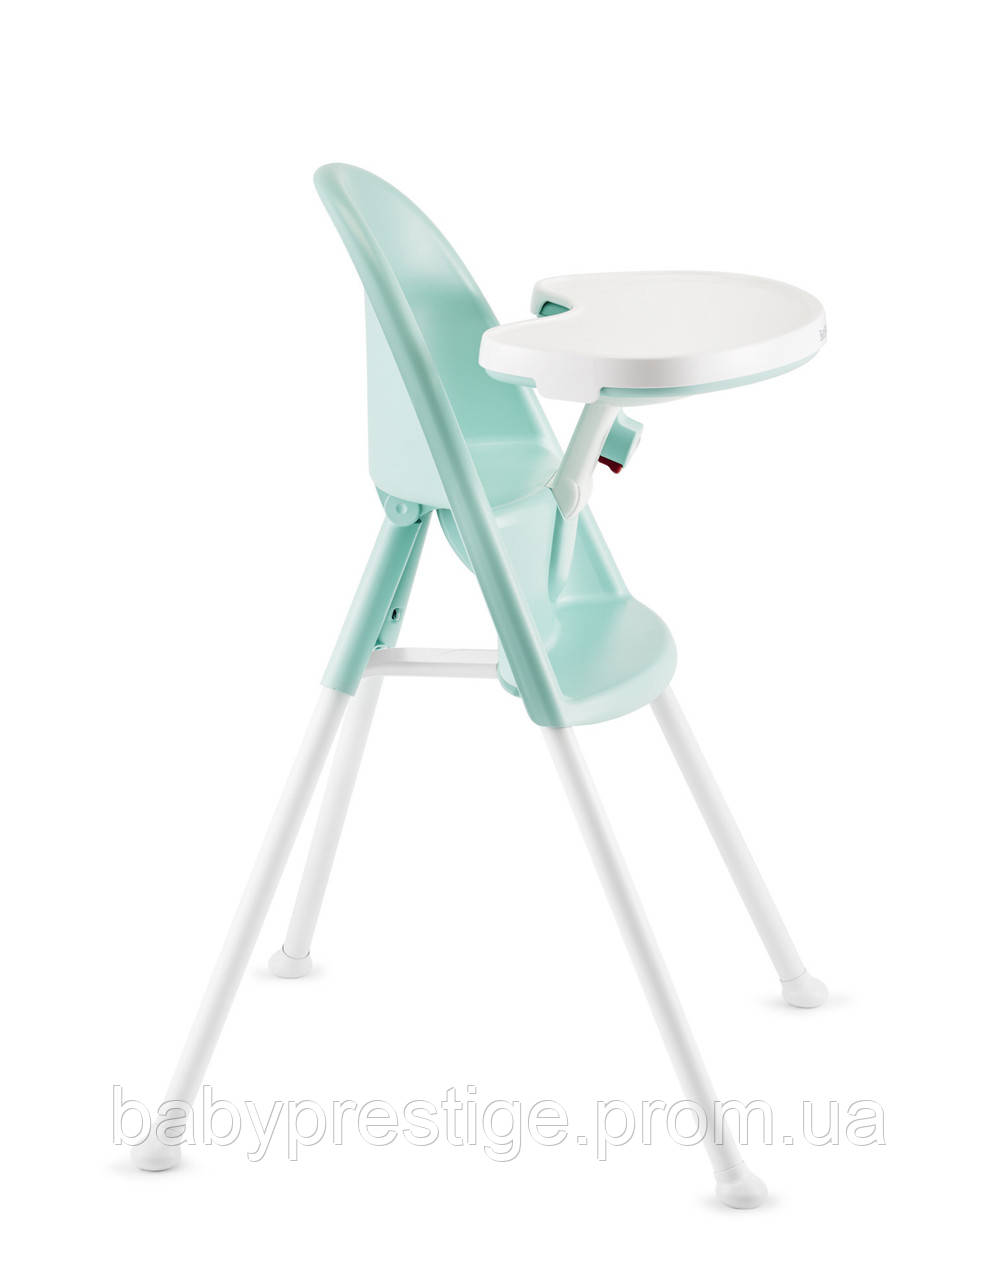 Стульчик для кормления Baby bjornHigh Chair, бирюзовый